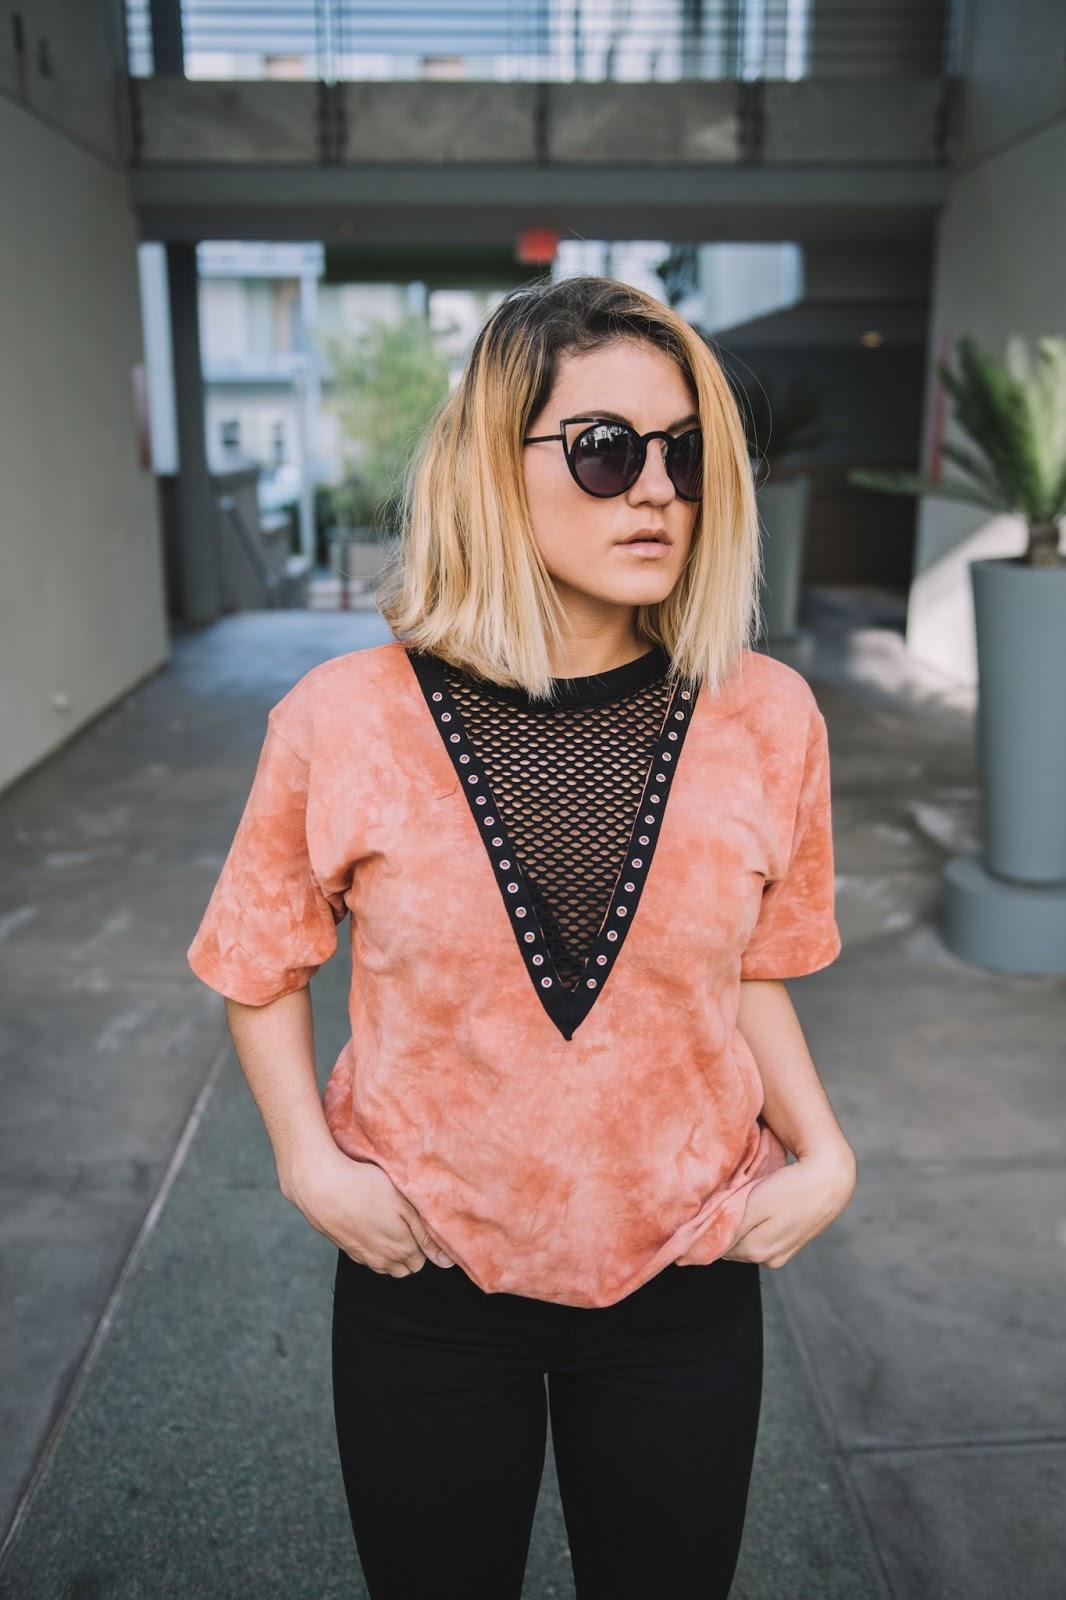 Forever21 Mesh Plunging Tee - Blogger Taylor Winkelmeyer